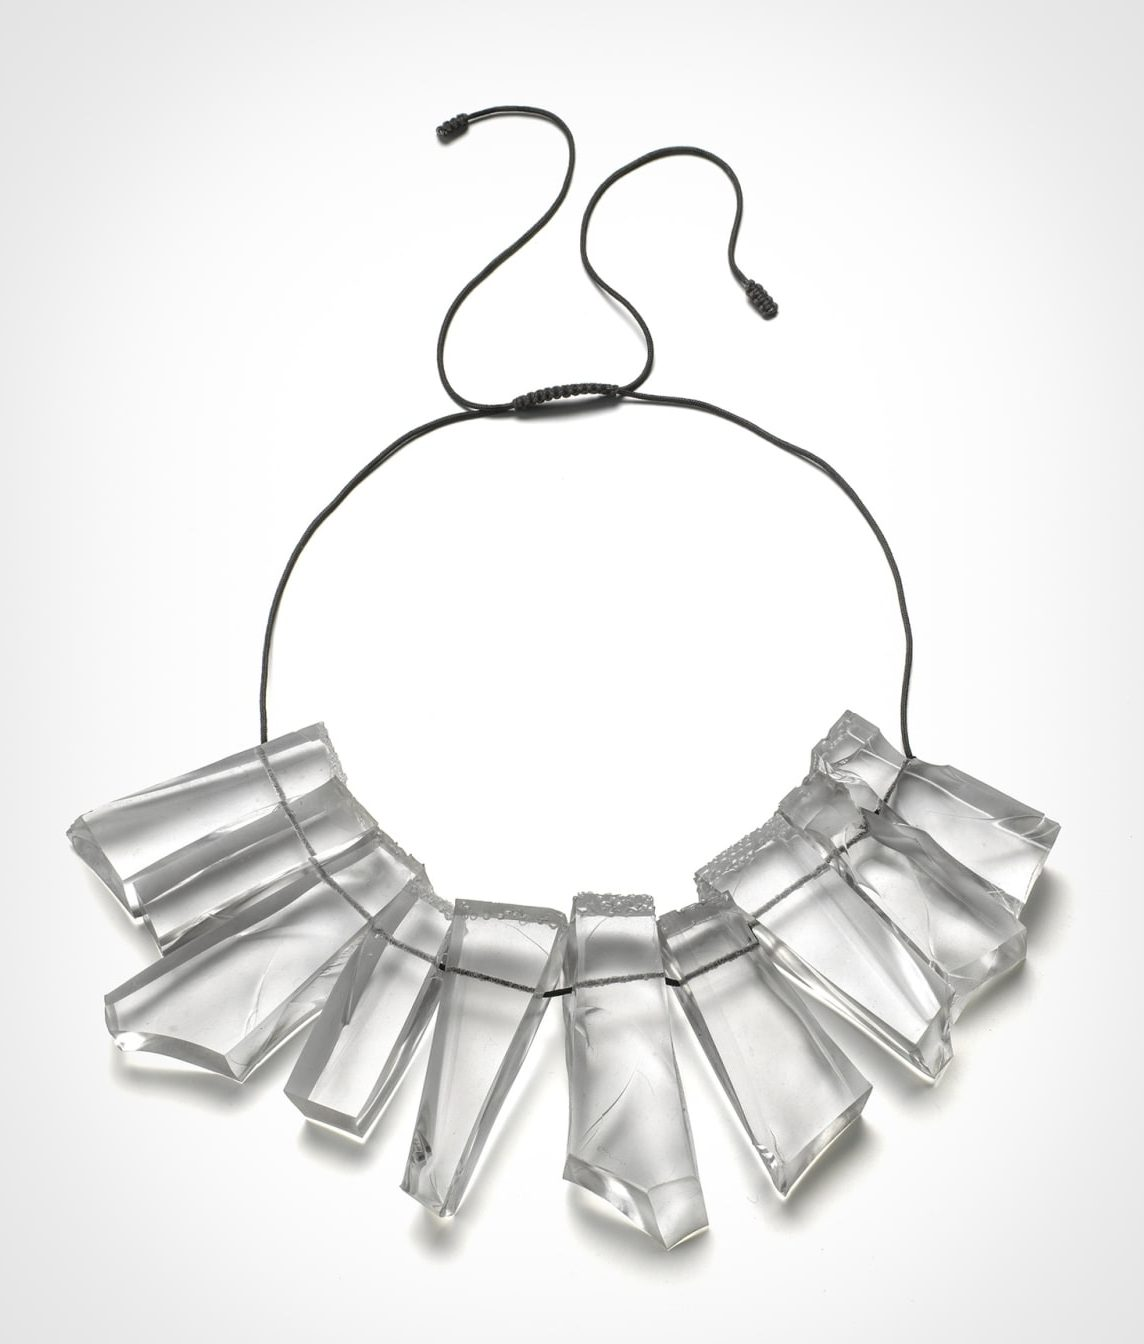 Ron Arad, Rocks Necklace, halssieraad, 2015, silicone, koord